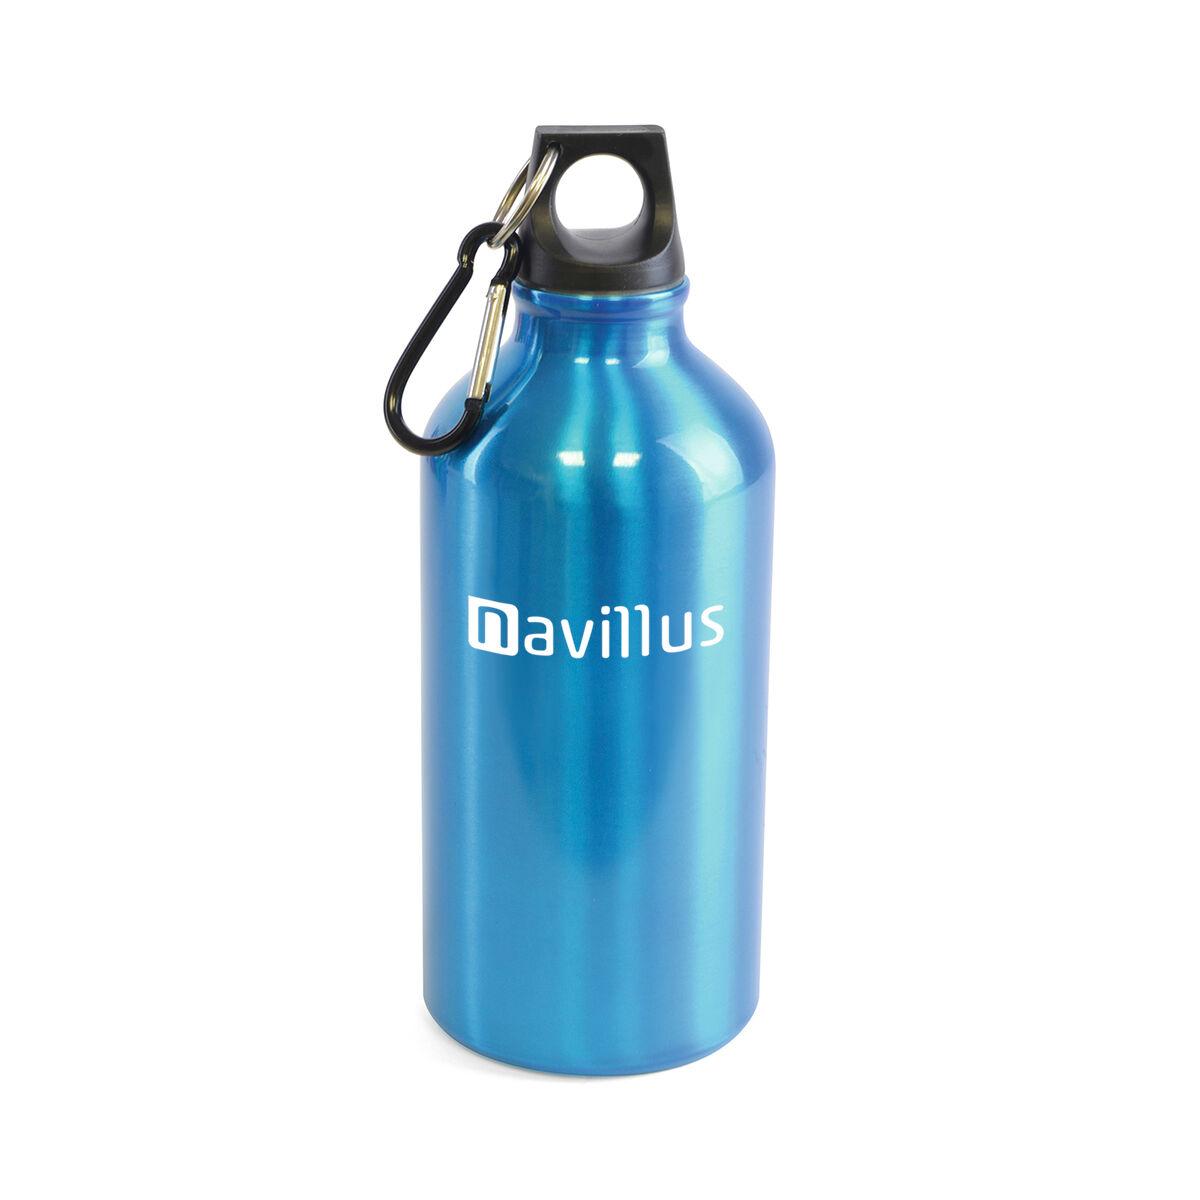 Aluminium Water Bottle 500ml with Carabiner